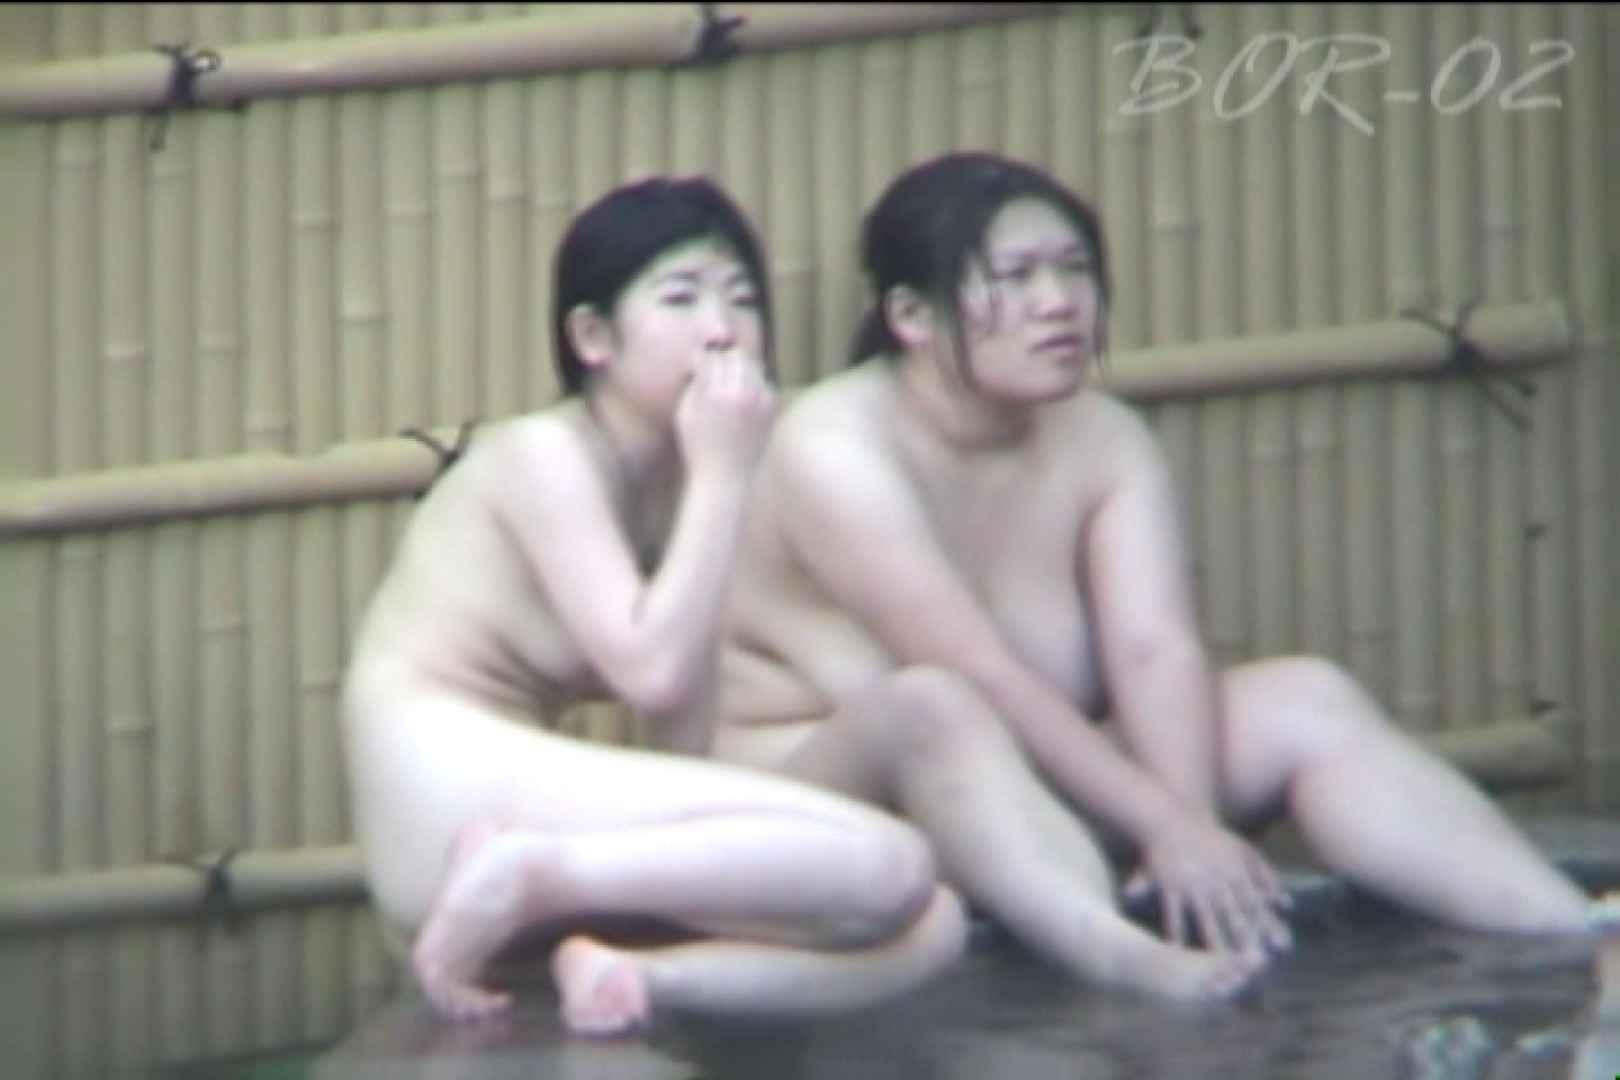 Aquaな露天風呂Vol.471 盗撮 | HなOL  66pic 28